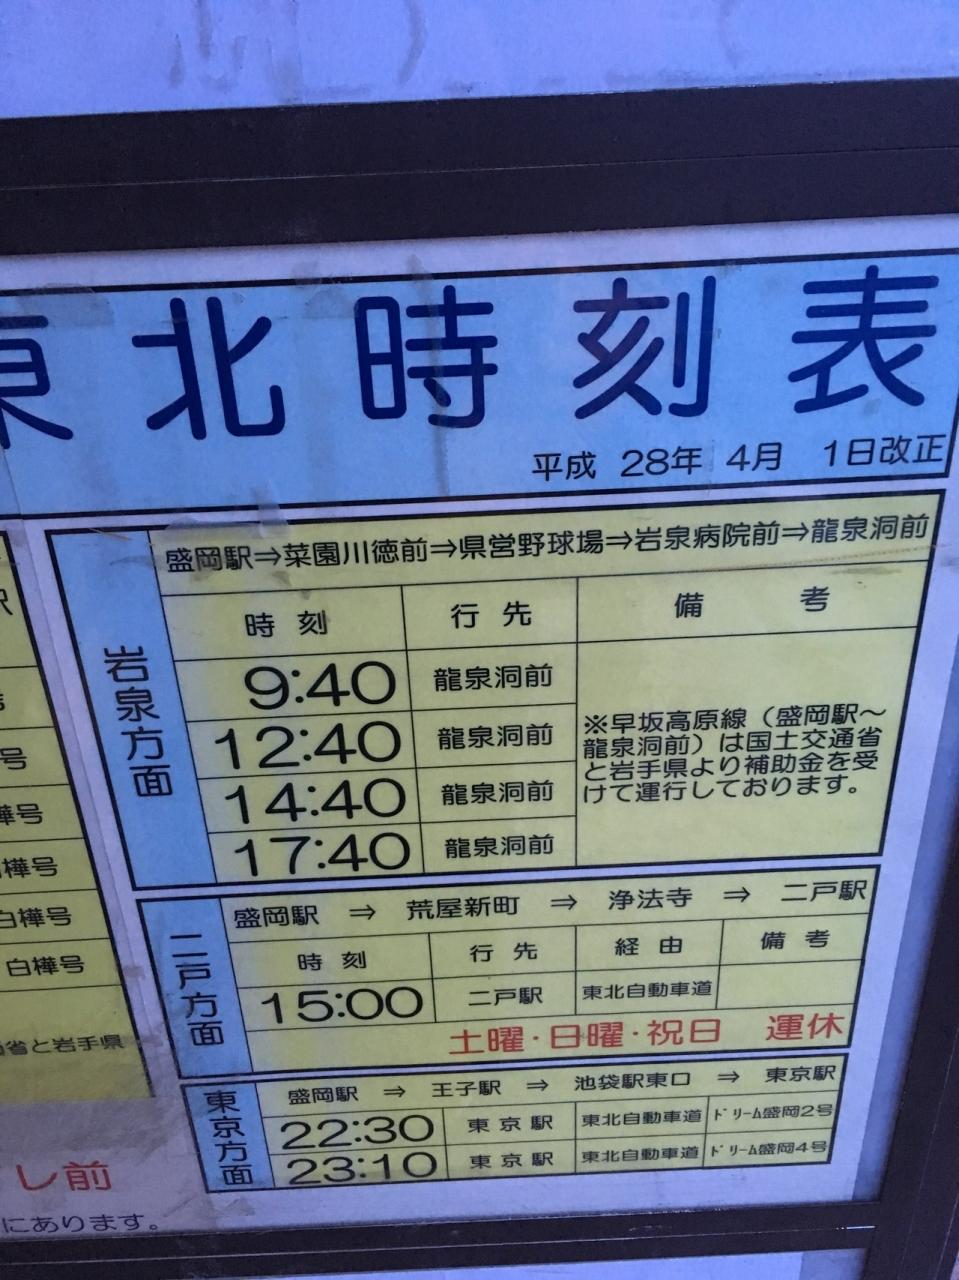 乗り場 バス 盛岡 駅